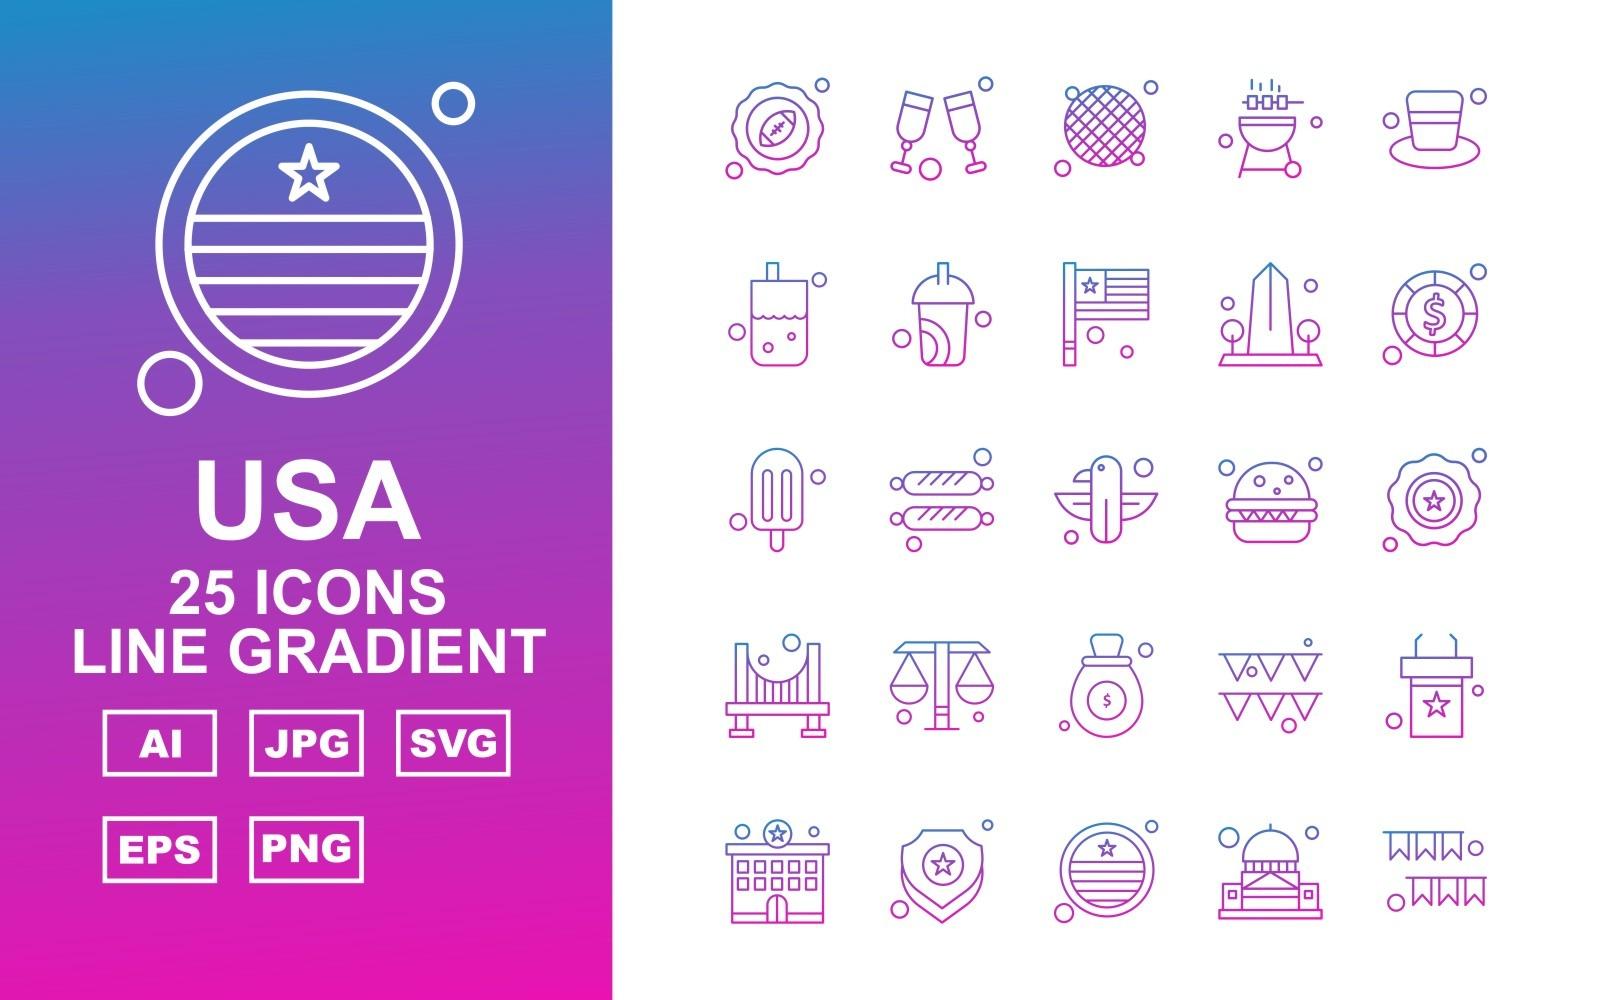 25 Premium USA Line Gradient Icon Pack Icon Sets 164743